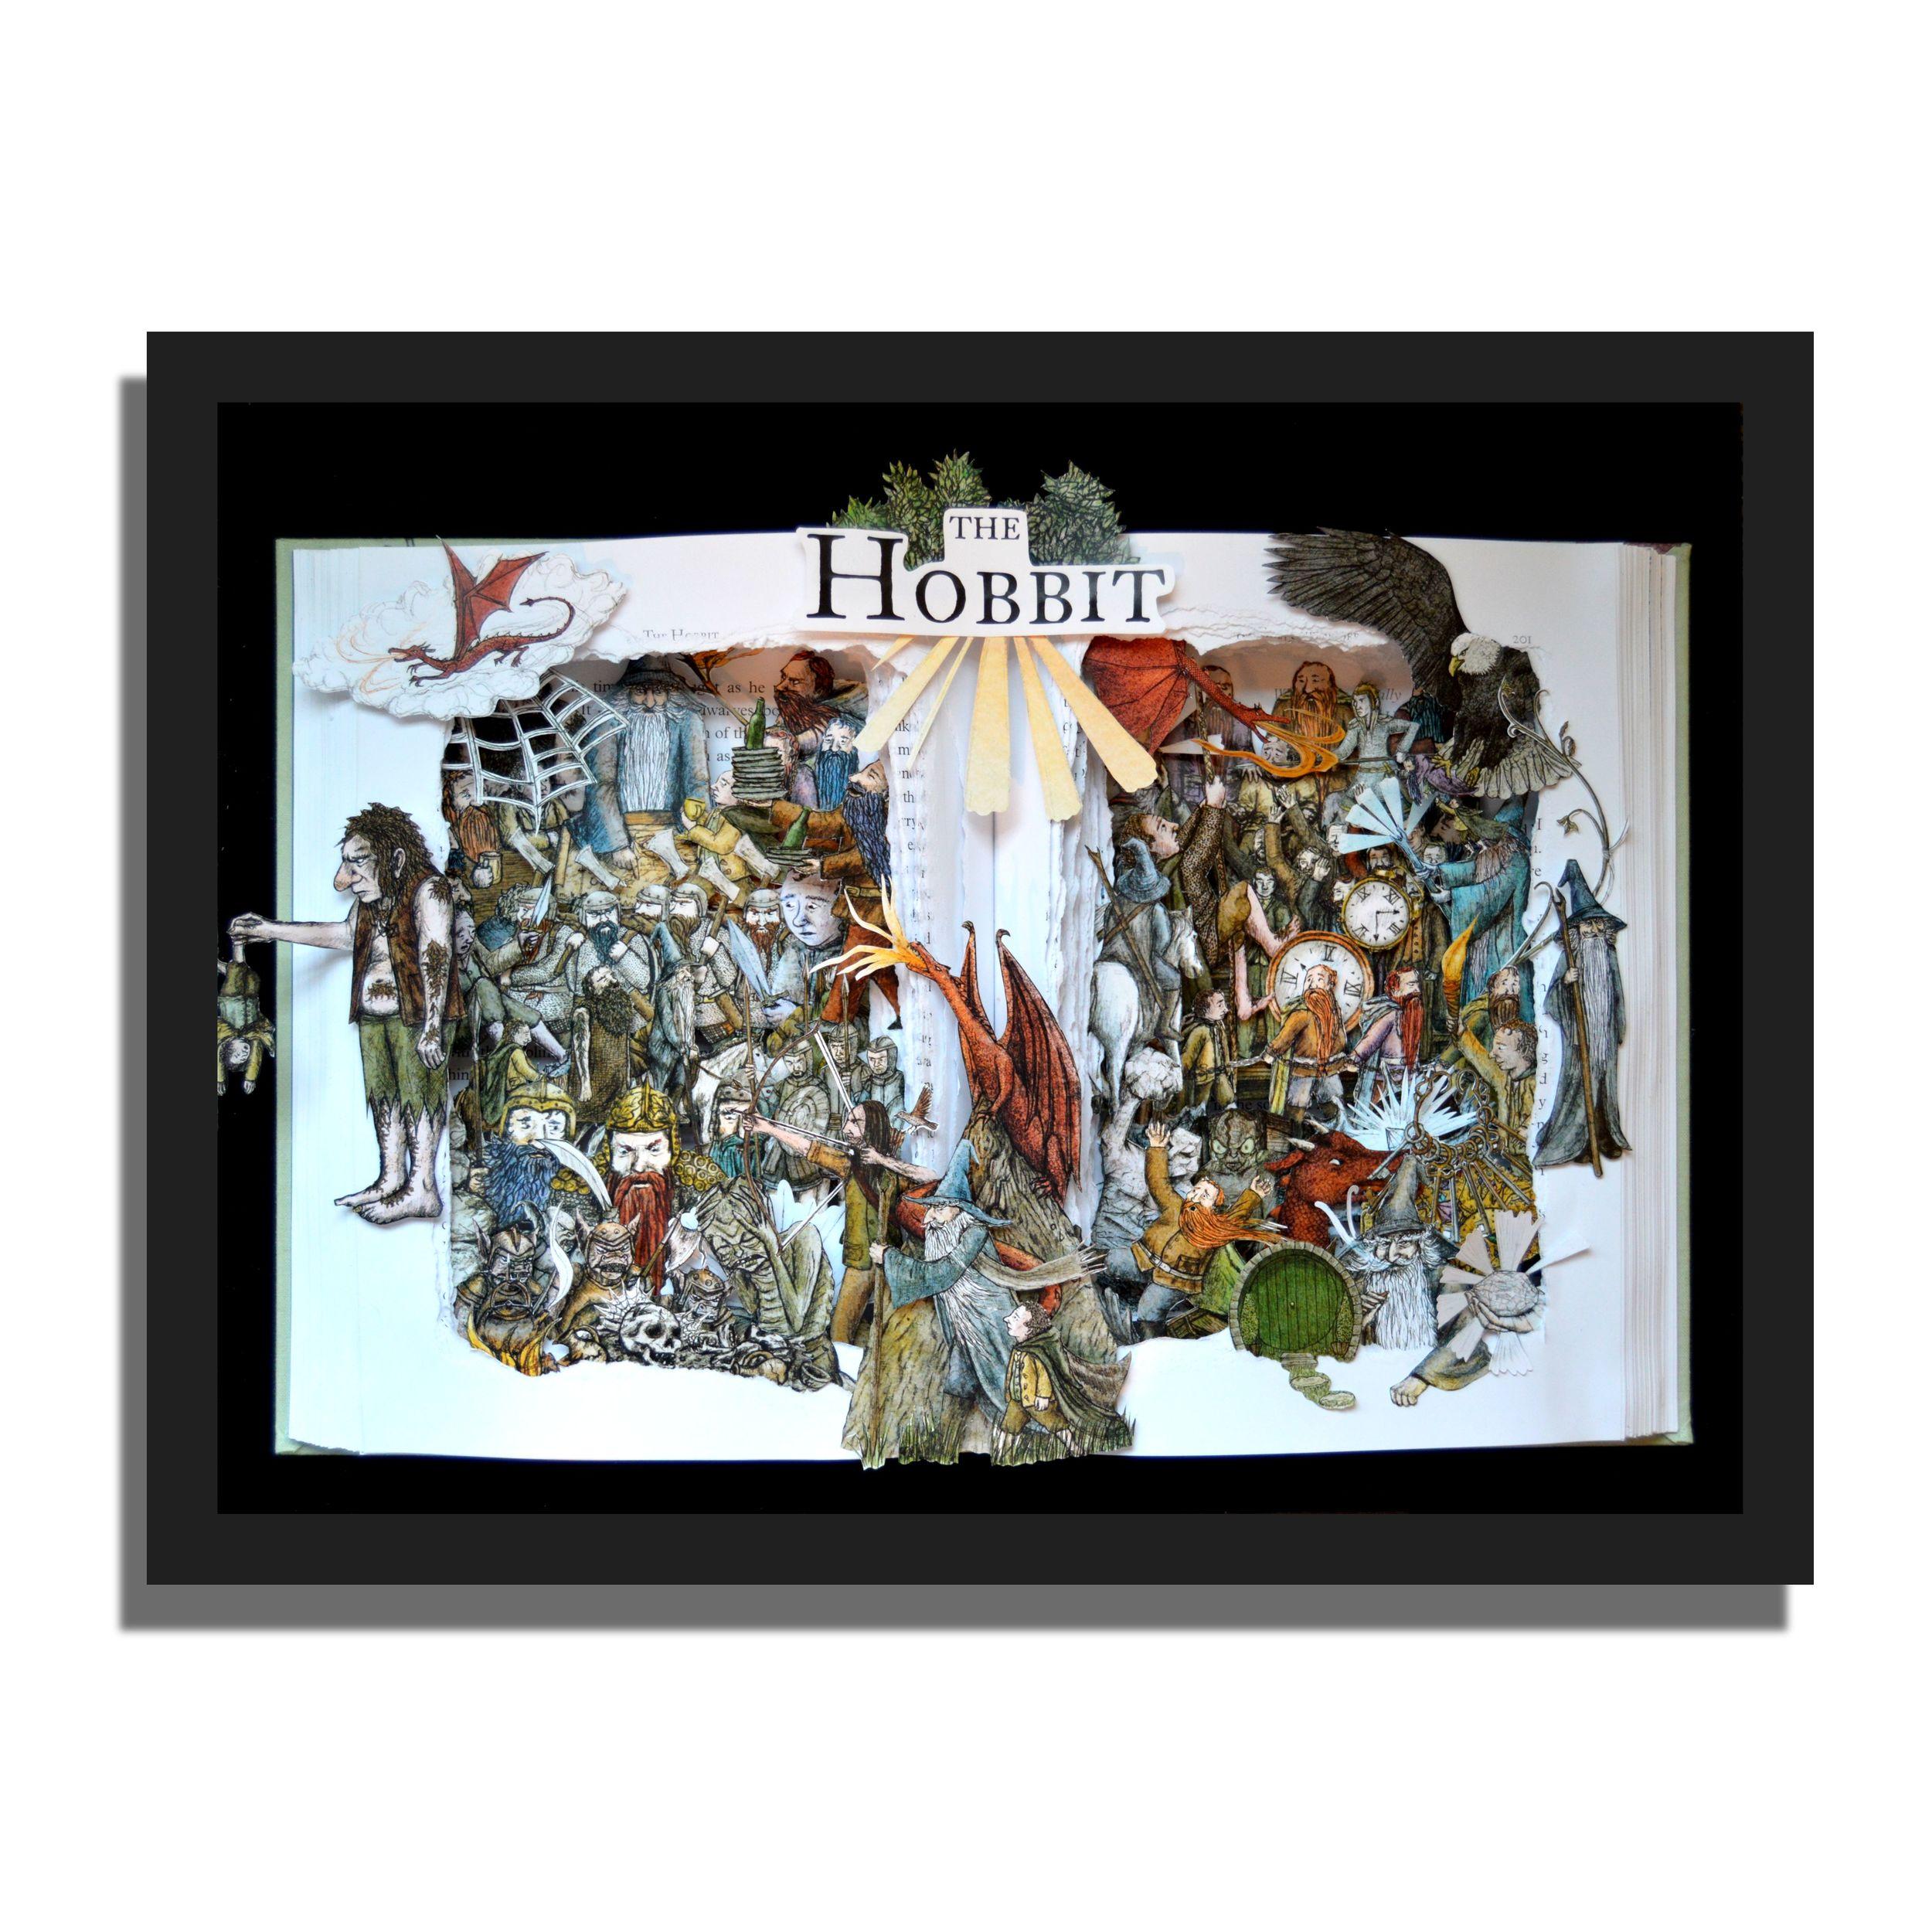 Hobbit - 12x16x3 Book Sculpture